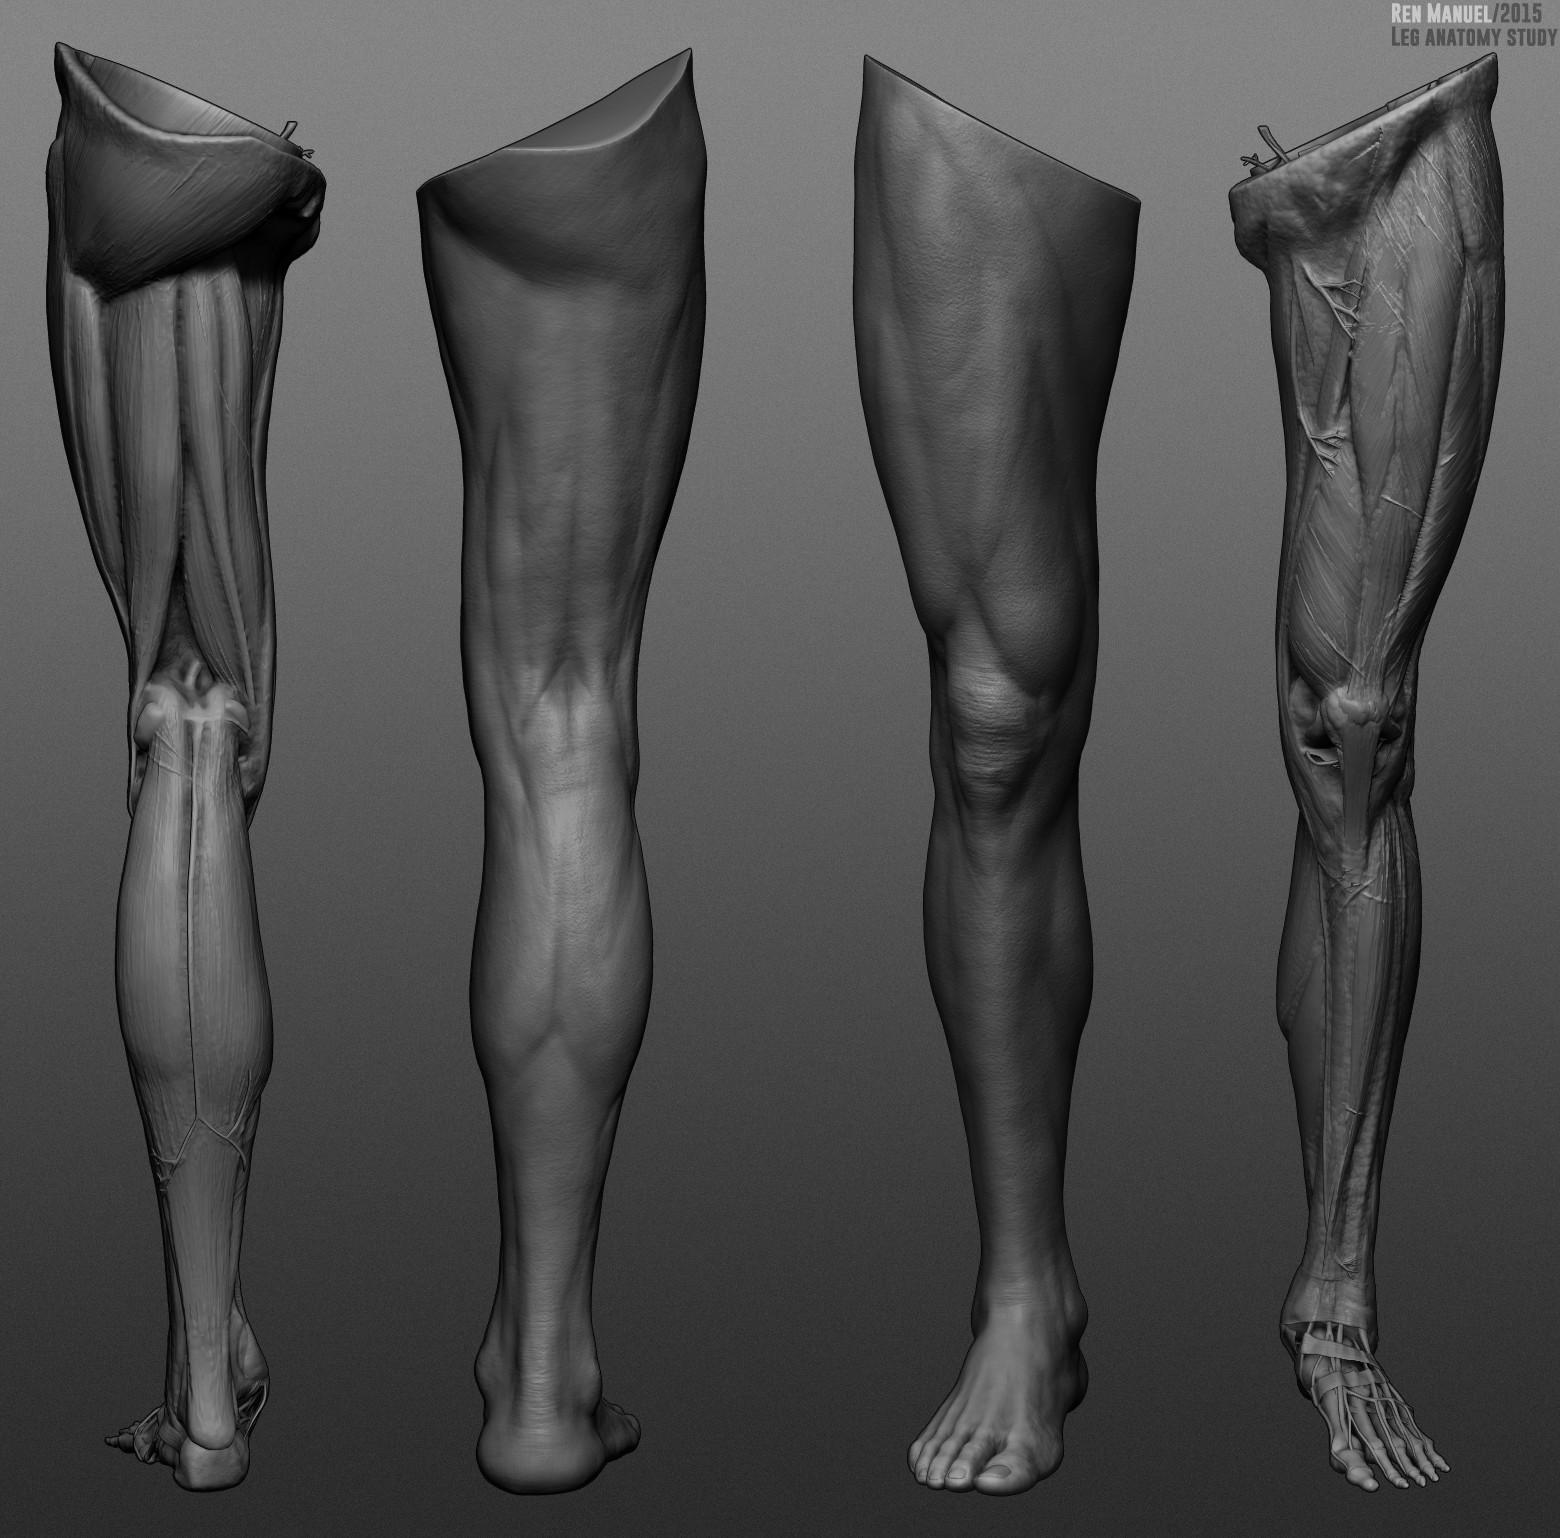 Artstation Leg Anatomy Study Ren Manuel